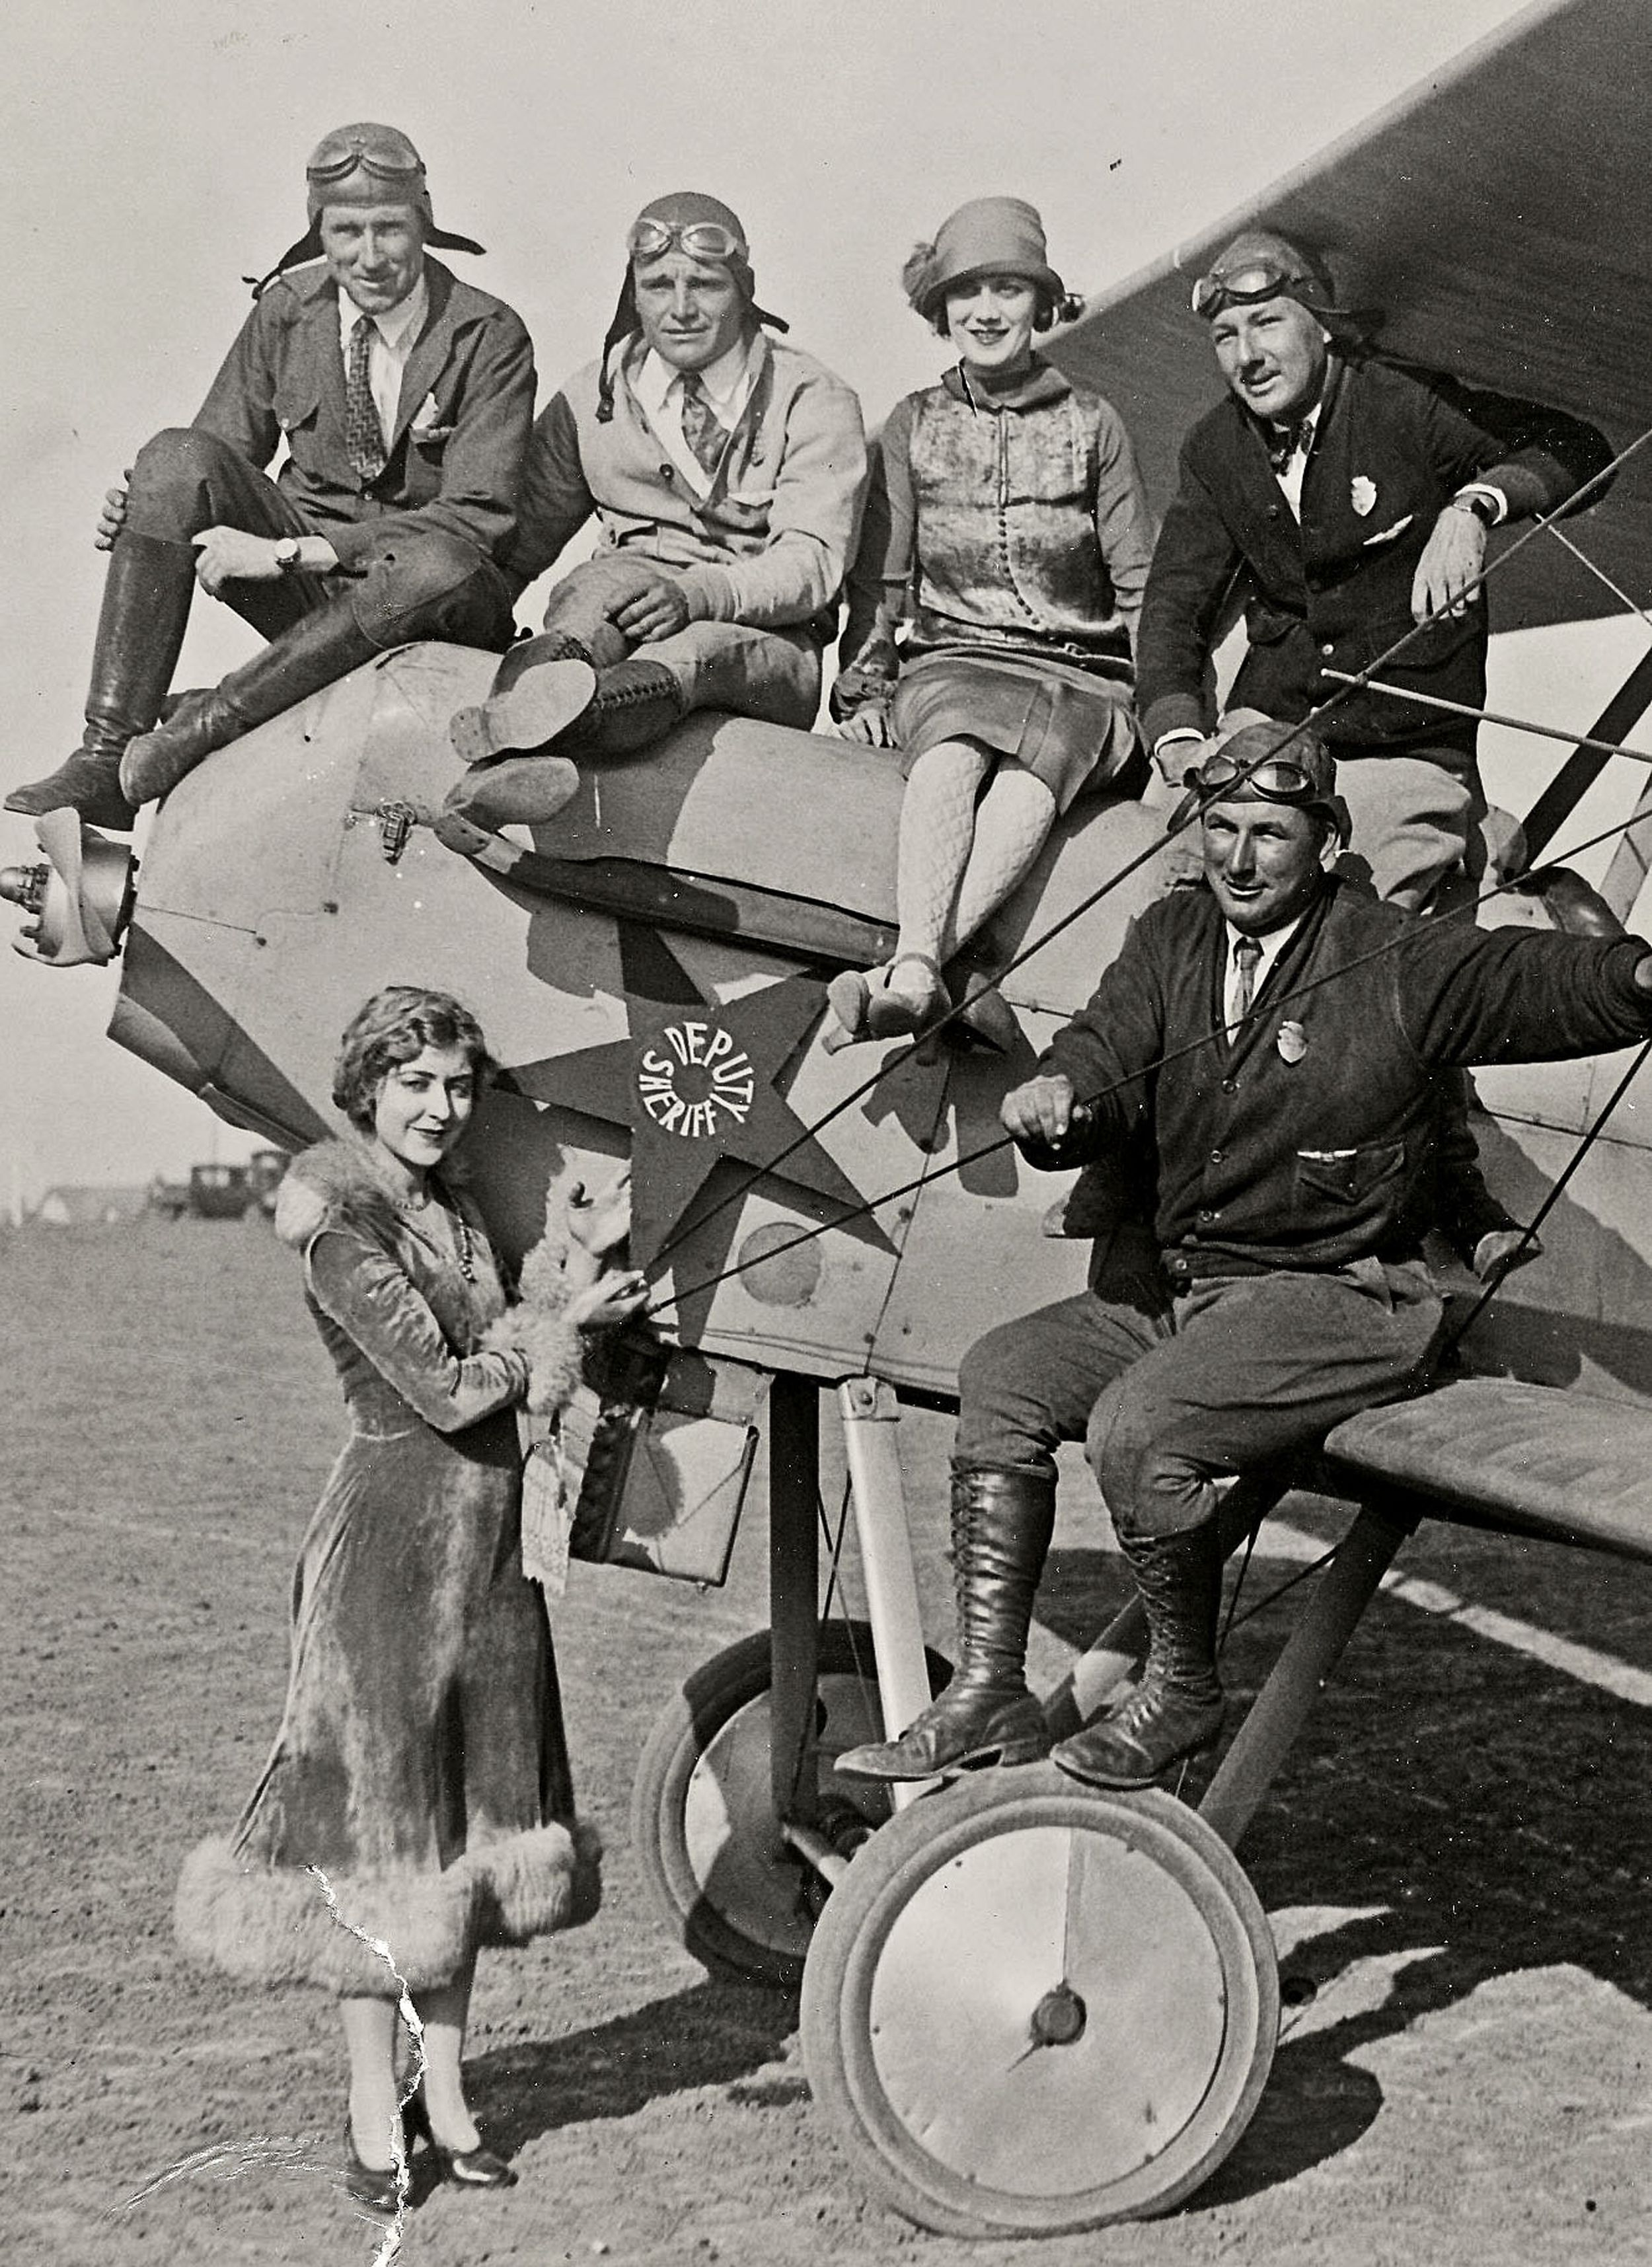 Los Angeles County Sheriff's Department Aero Bureau 1926